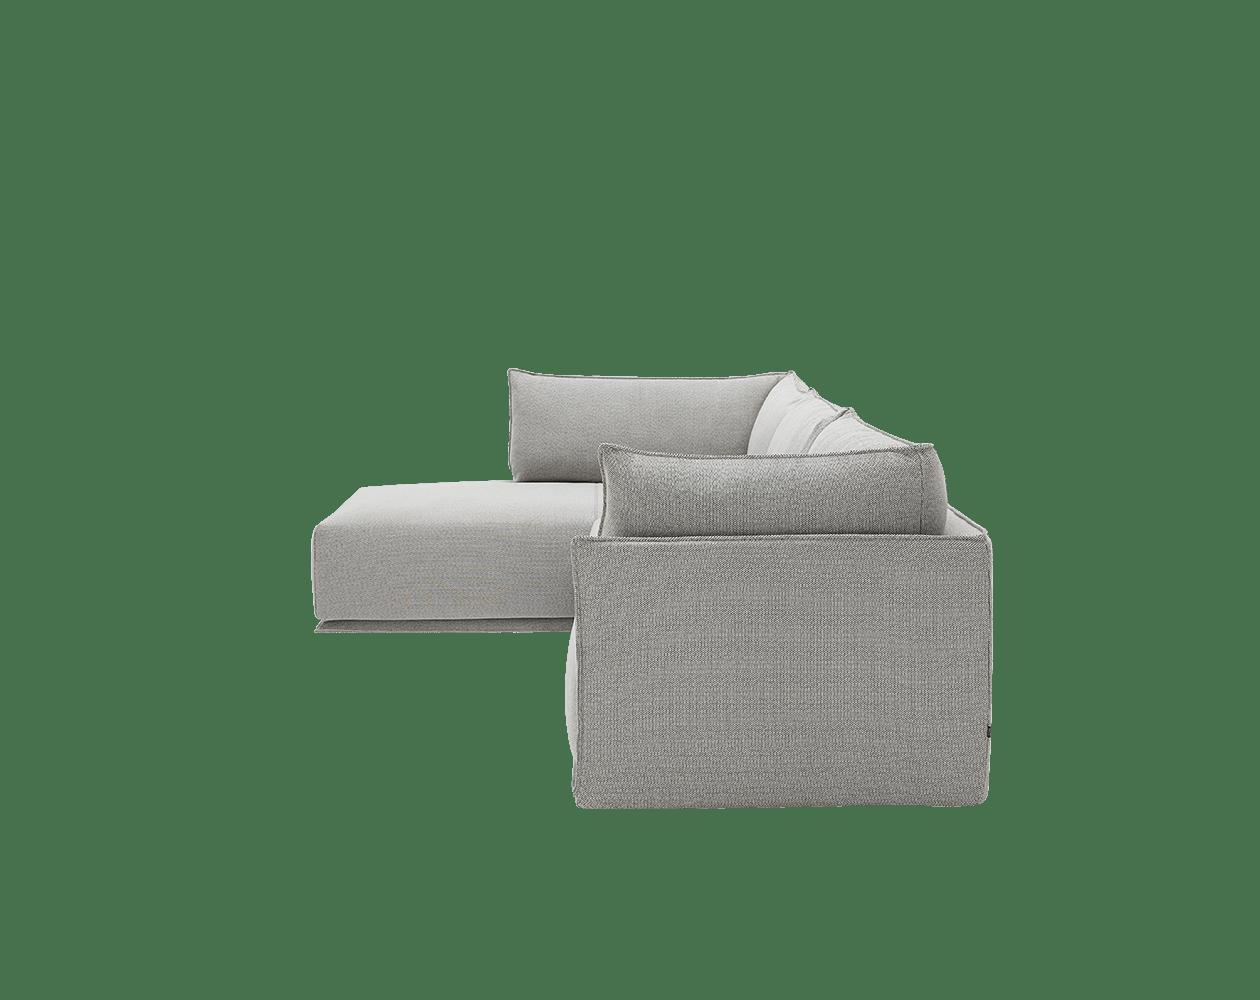 Remarkable Max Sofa Sp01 Design Theyellowbook Wood Chair Design Ideas Theyellowbookinfo